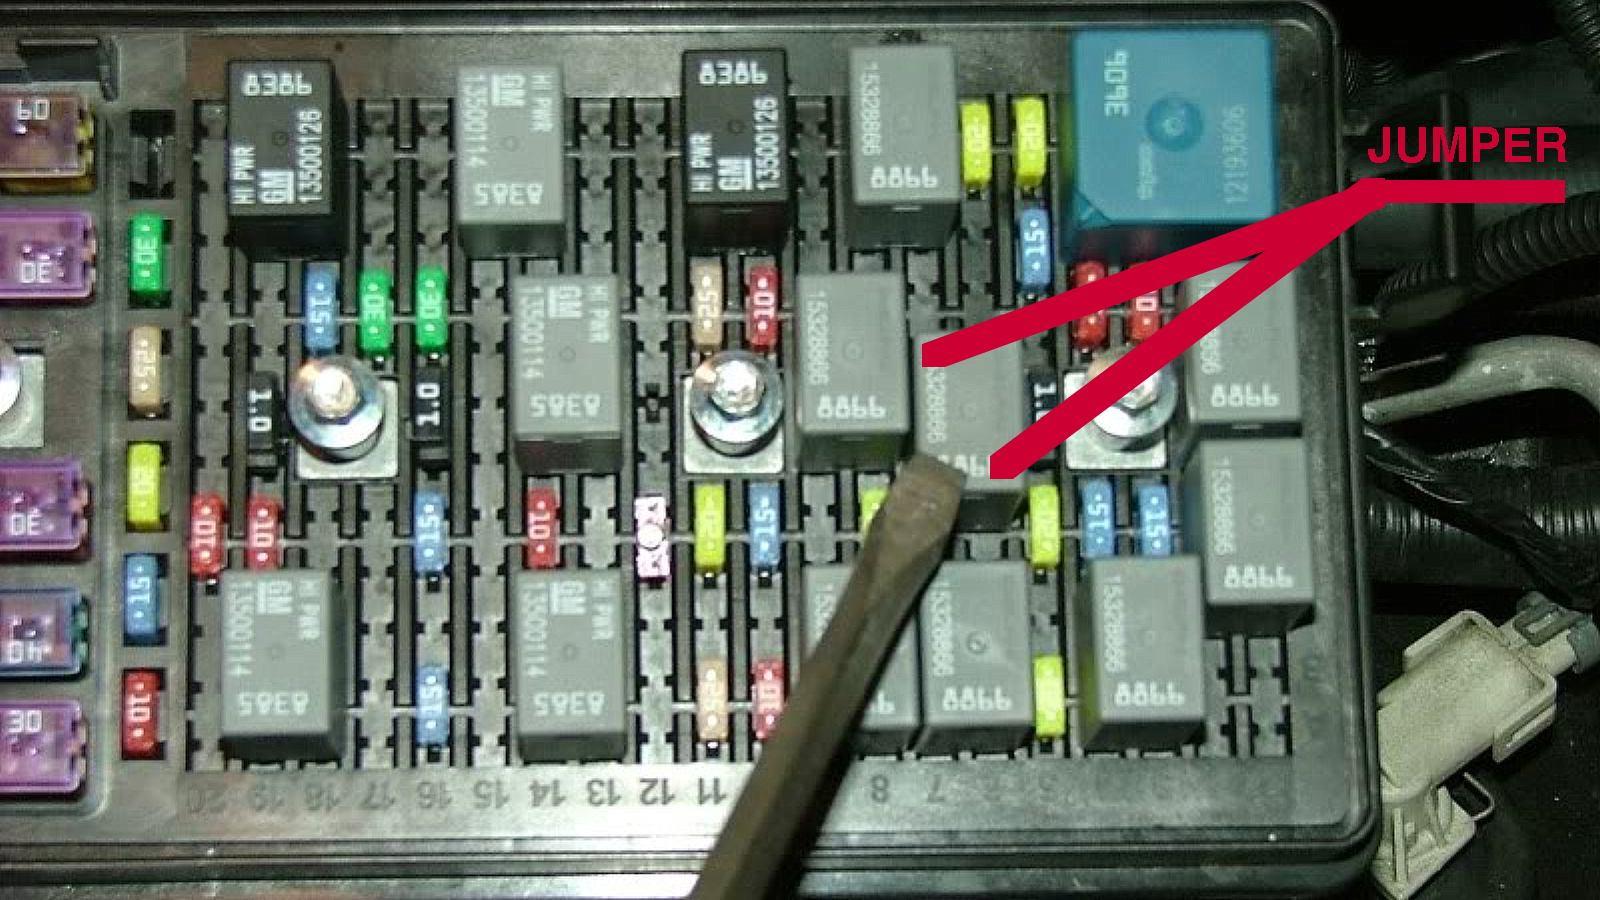 Dscf Jumper additionally V Rfrm Fuse Relay Panel F additionally D Ml Daylight Diy Fuse Box Cir Stud furthermore  moreover Htb Cenlnxxxxxazapxxq Xxfxxxy. on fuse box terminals